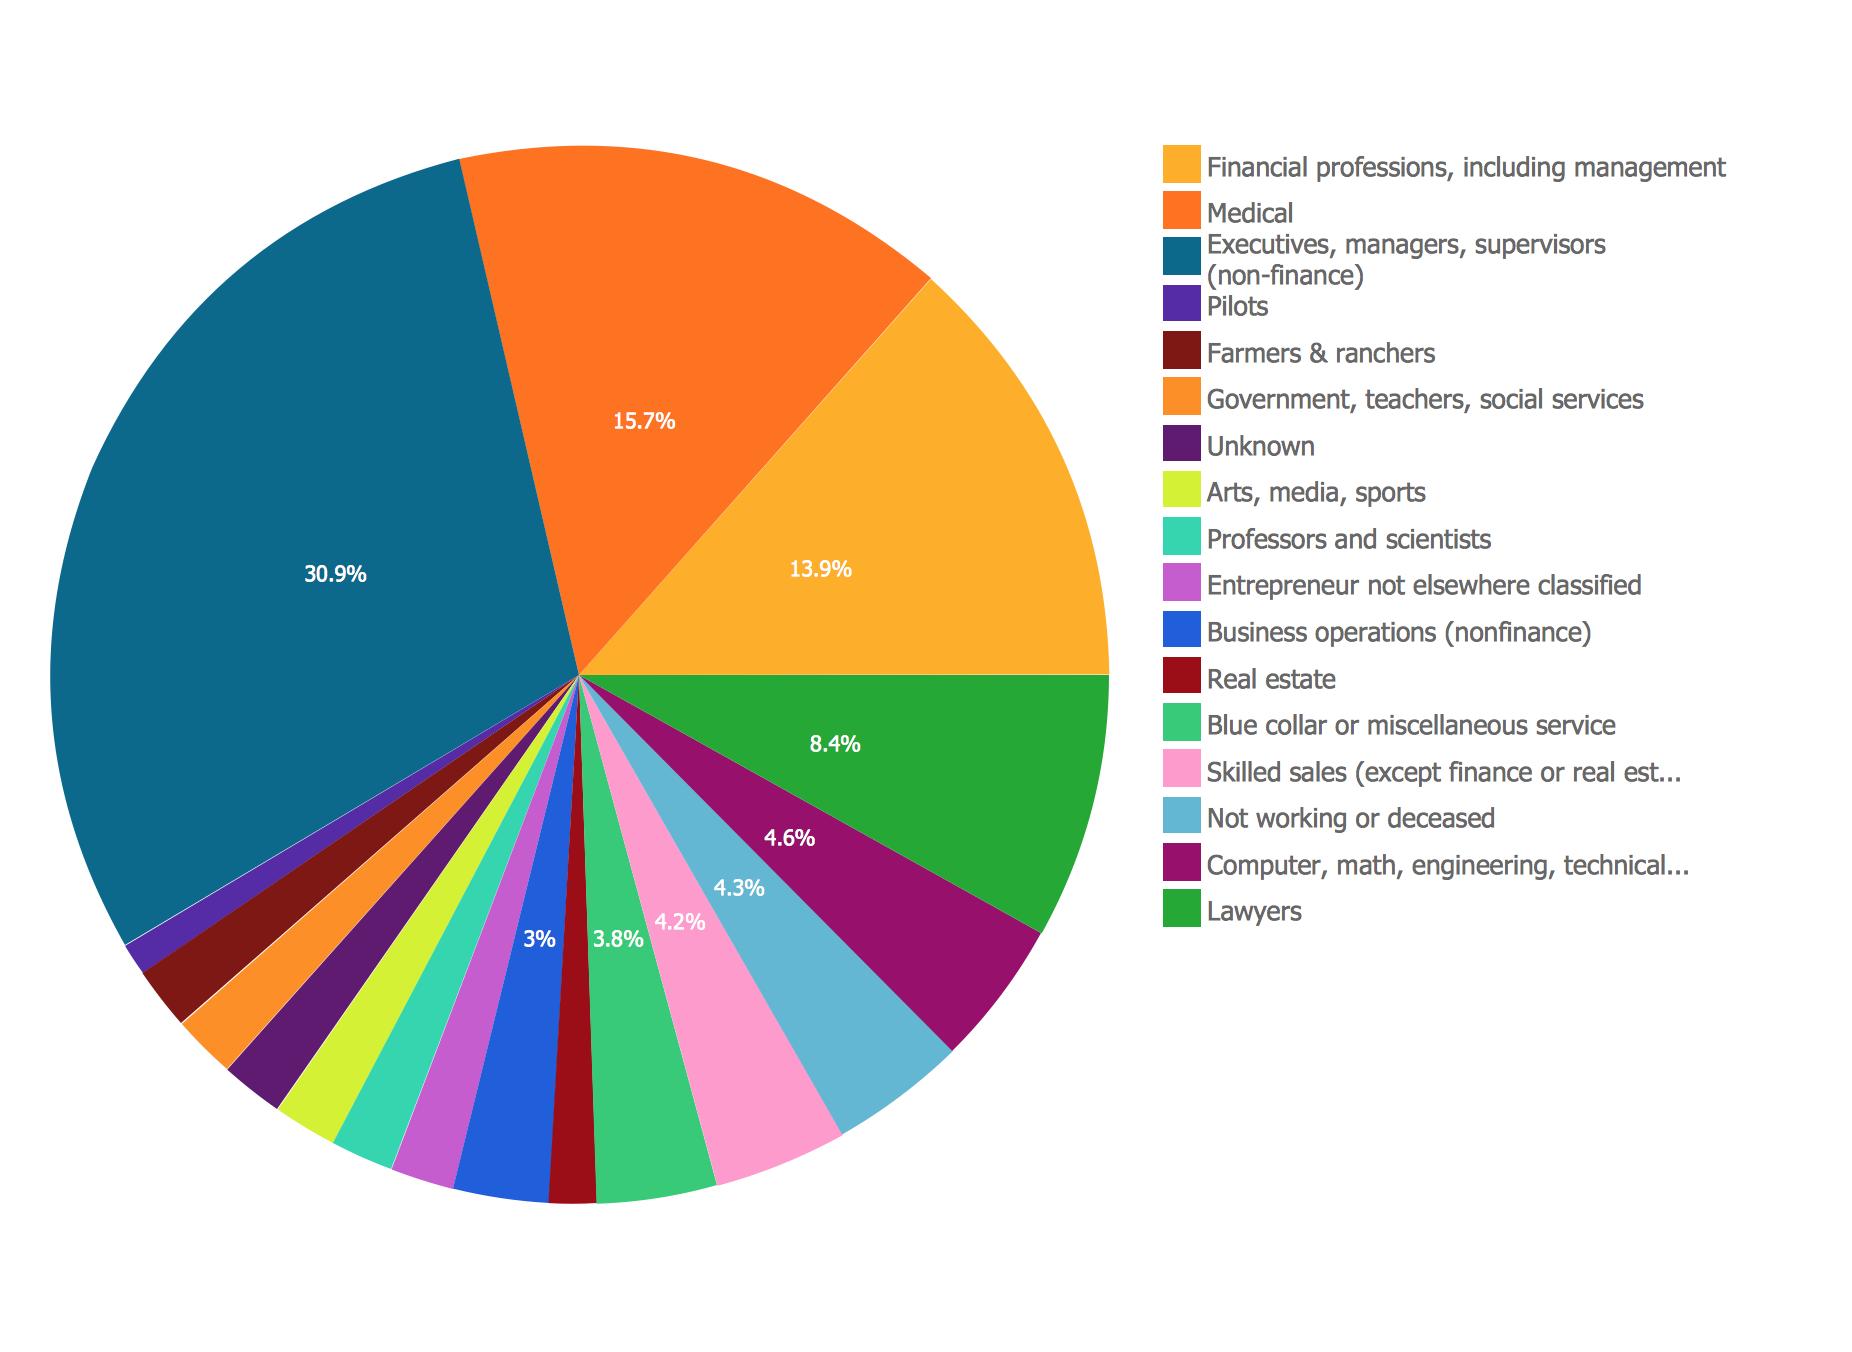 Pie Chart Business Report Business Social Services Pie Chart [ 1352 x 1852 Pixel ]